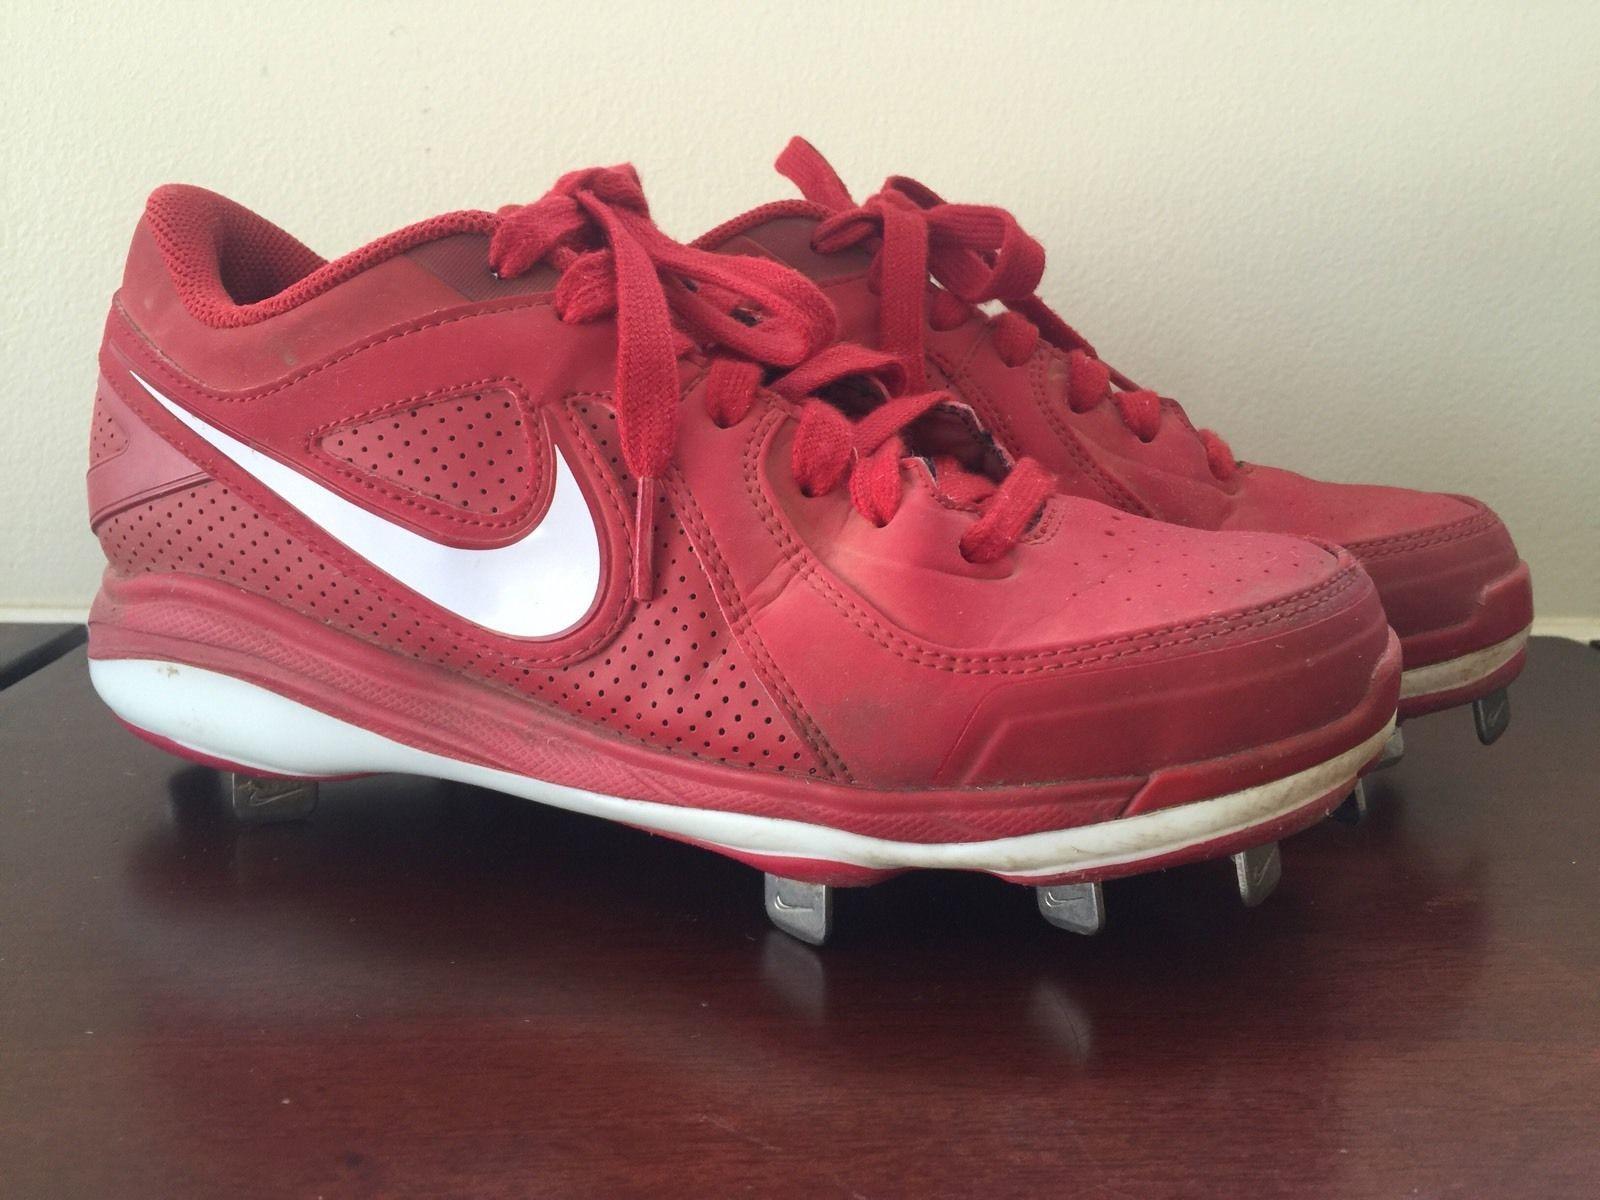 premium selection d7959 c31ce Men Nike MVP Pro Baseball Red Soccer Cleats Size 5.5